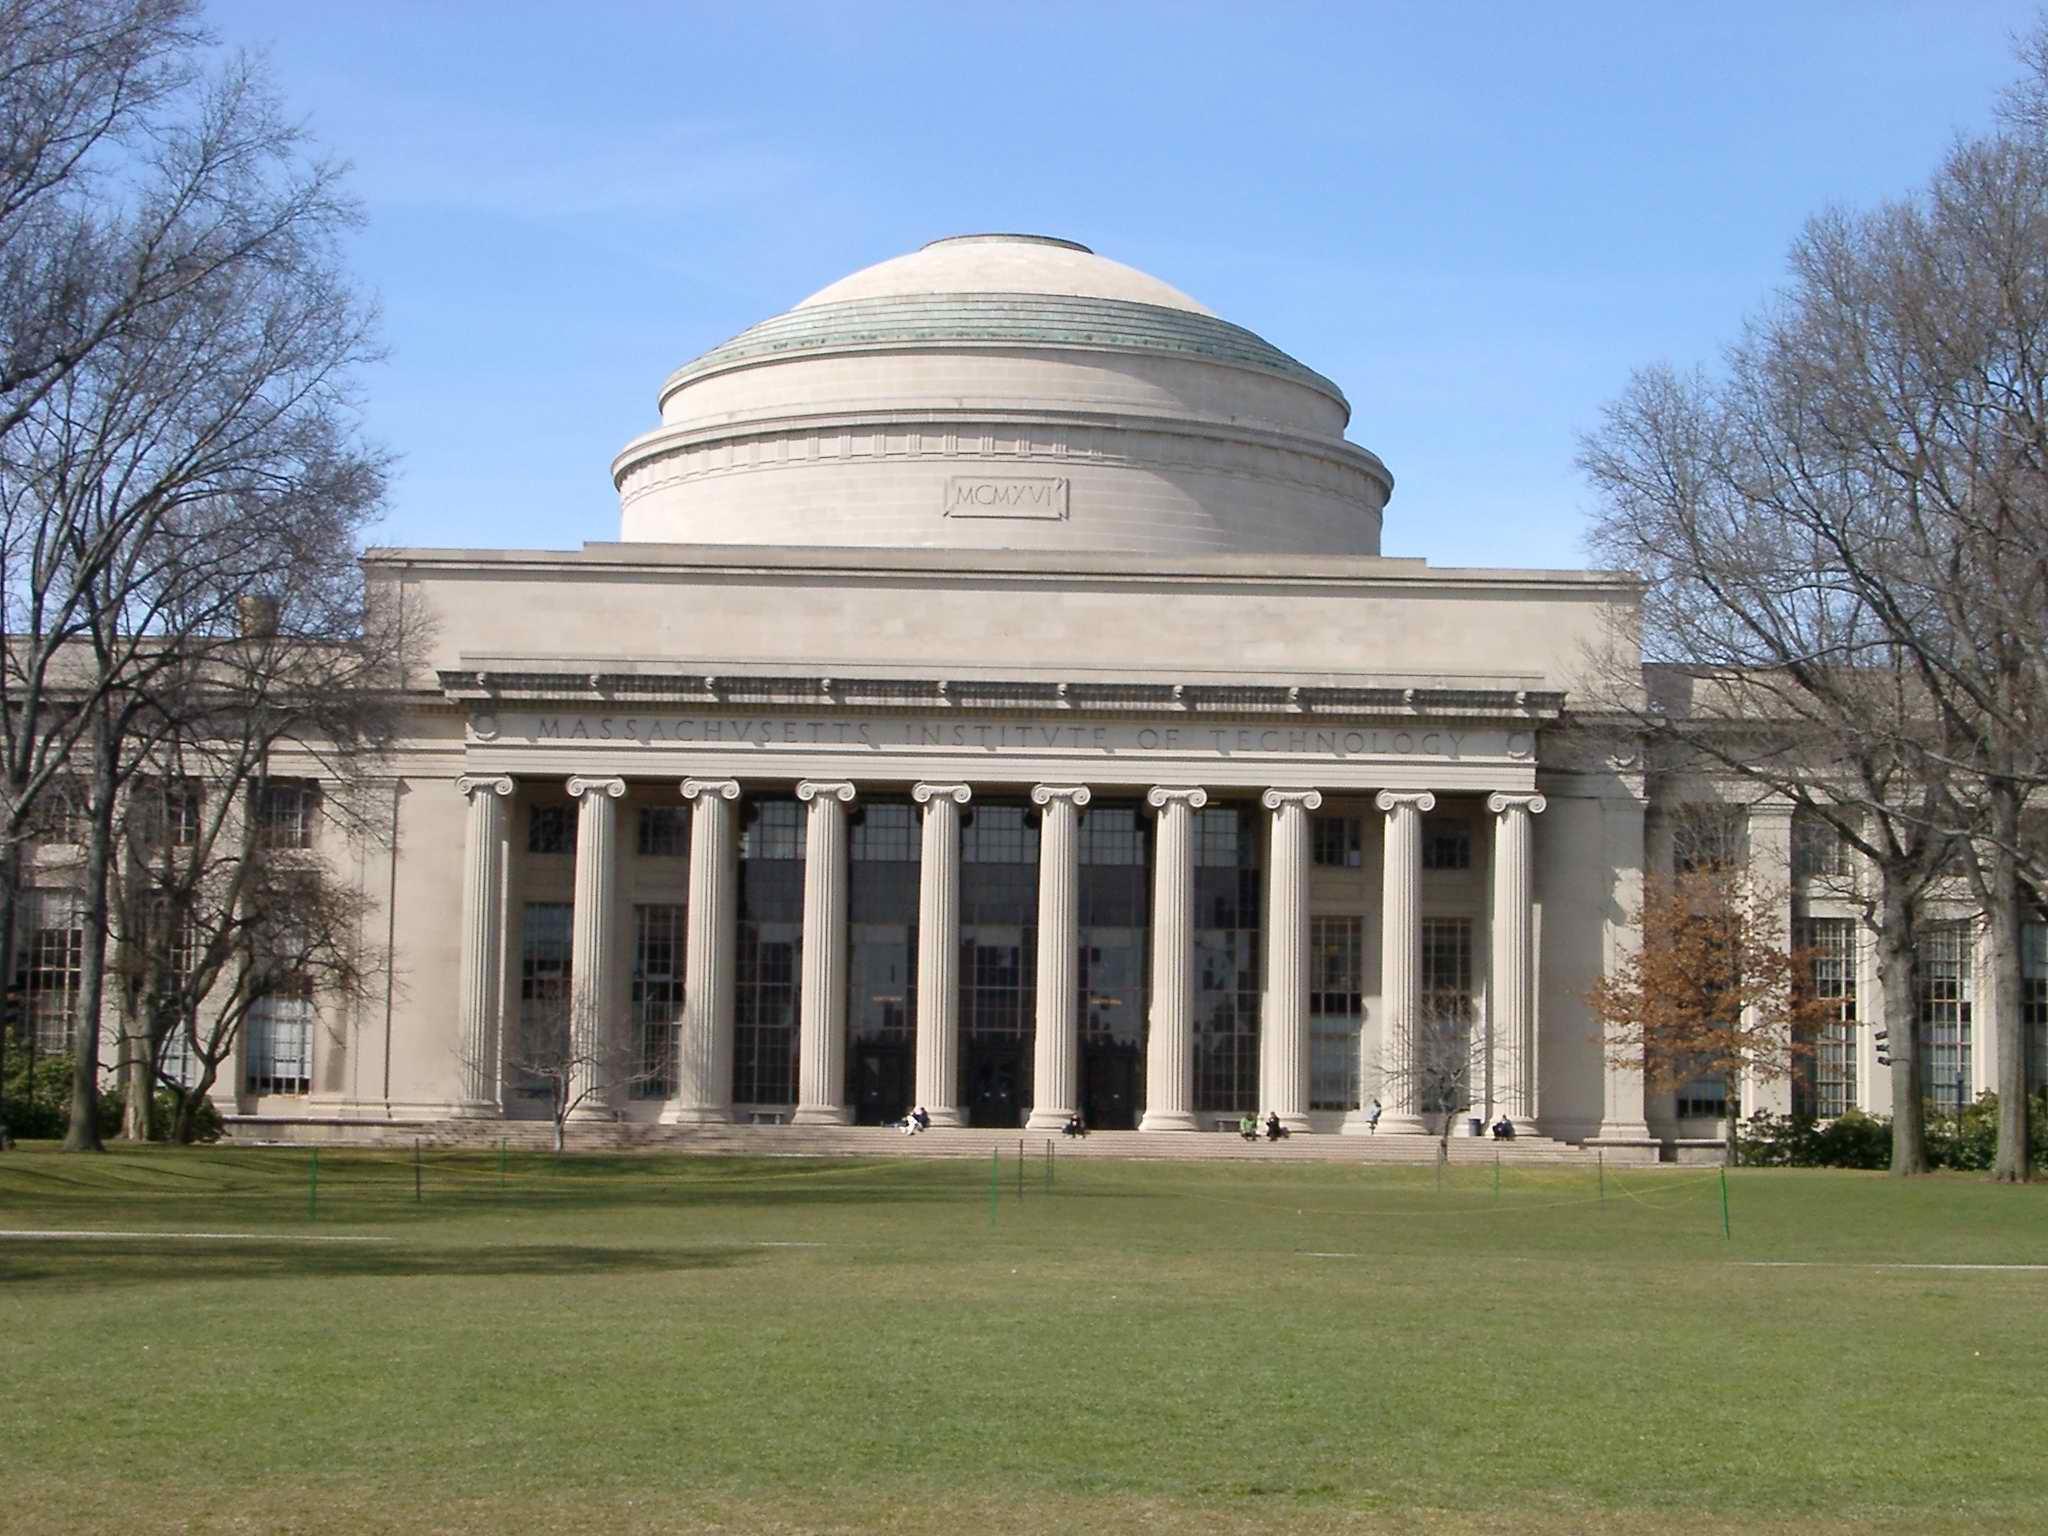 Jim Sells Cambridge - Massachusetts Institute of Technology